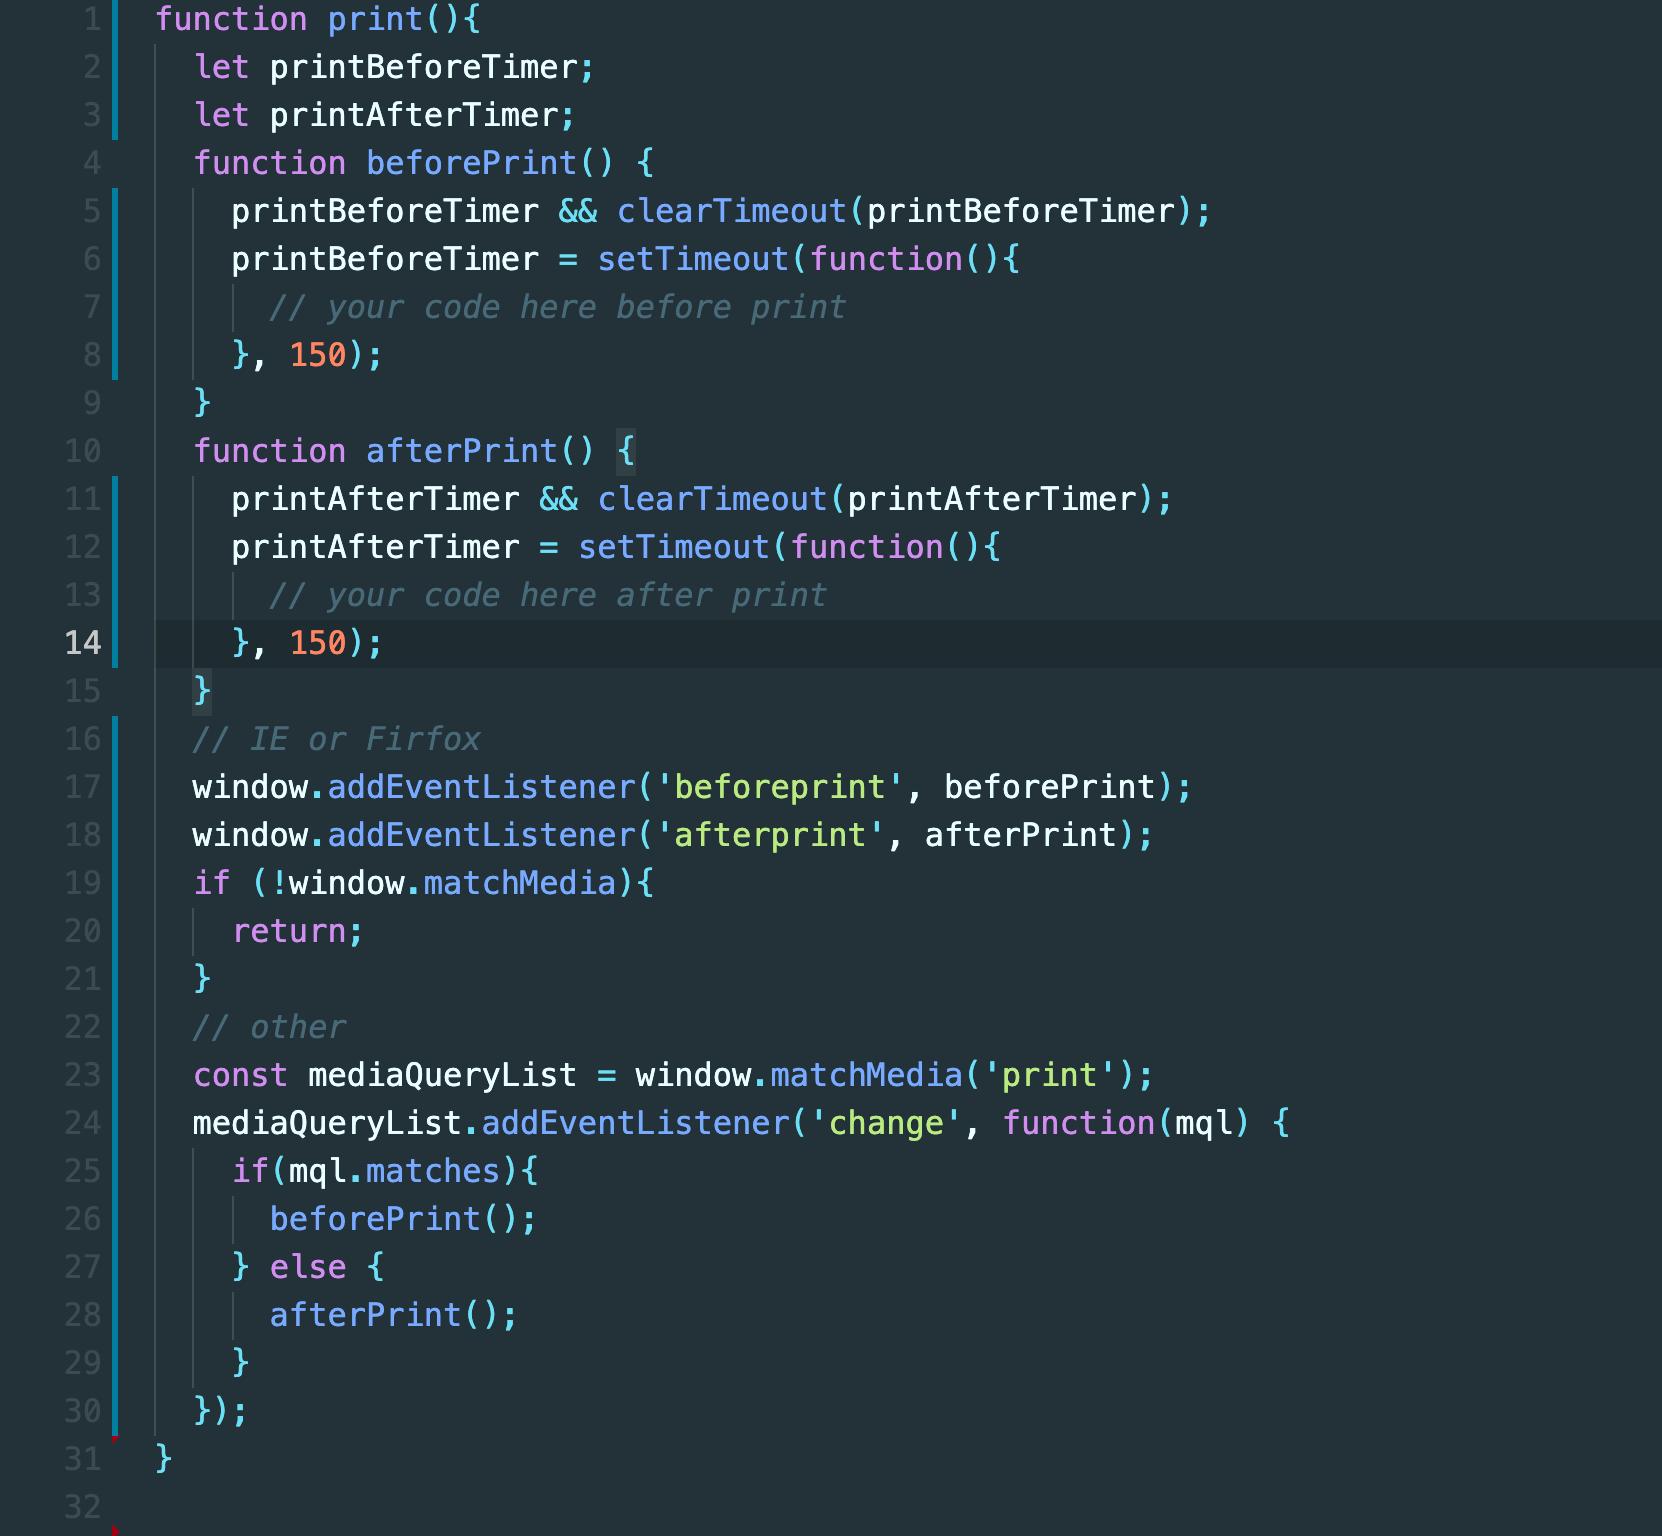 使用JavaScript检测打印请求